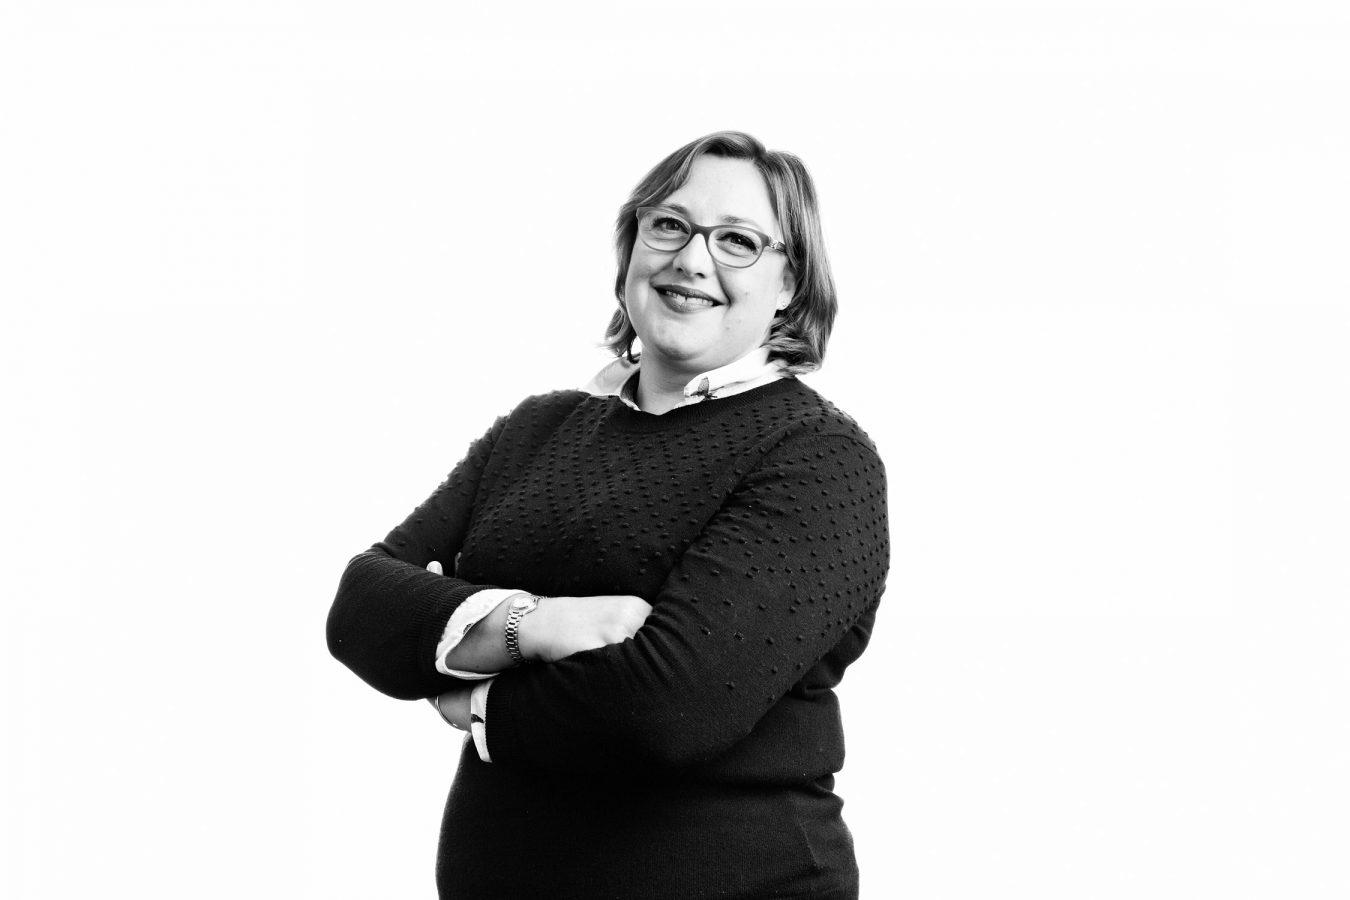 Taylor-Vinters-staff-portrait-studio-black-and-white-london